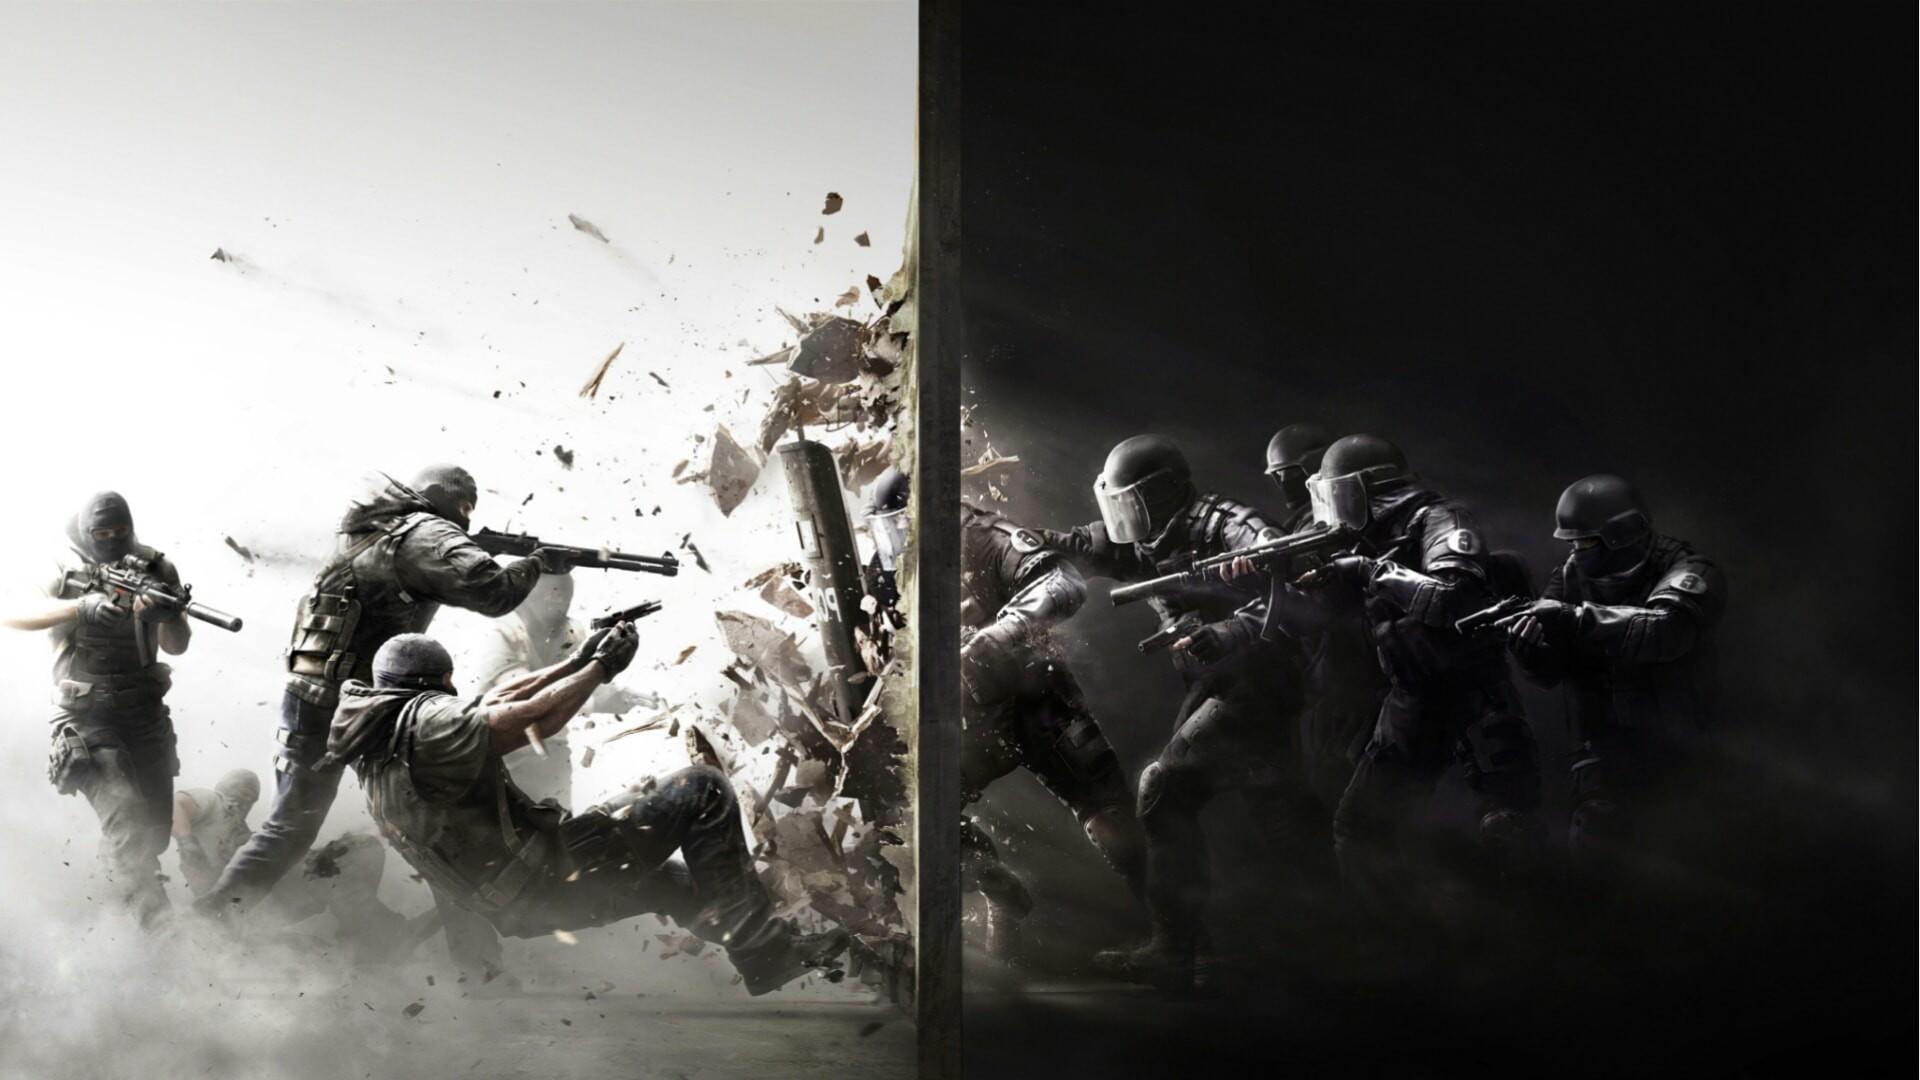 … Tom Clancy's Rainbow Six: Siege widescreen wallpapers